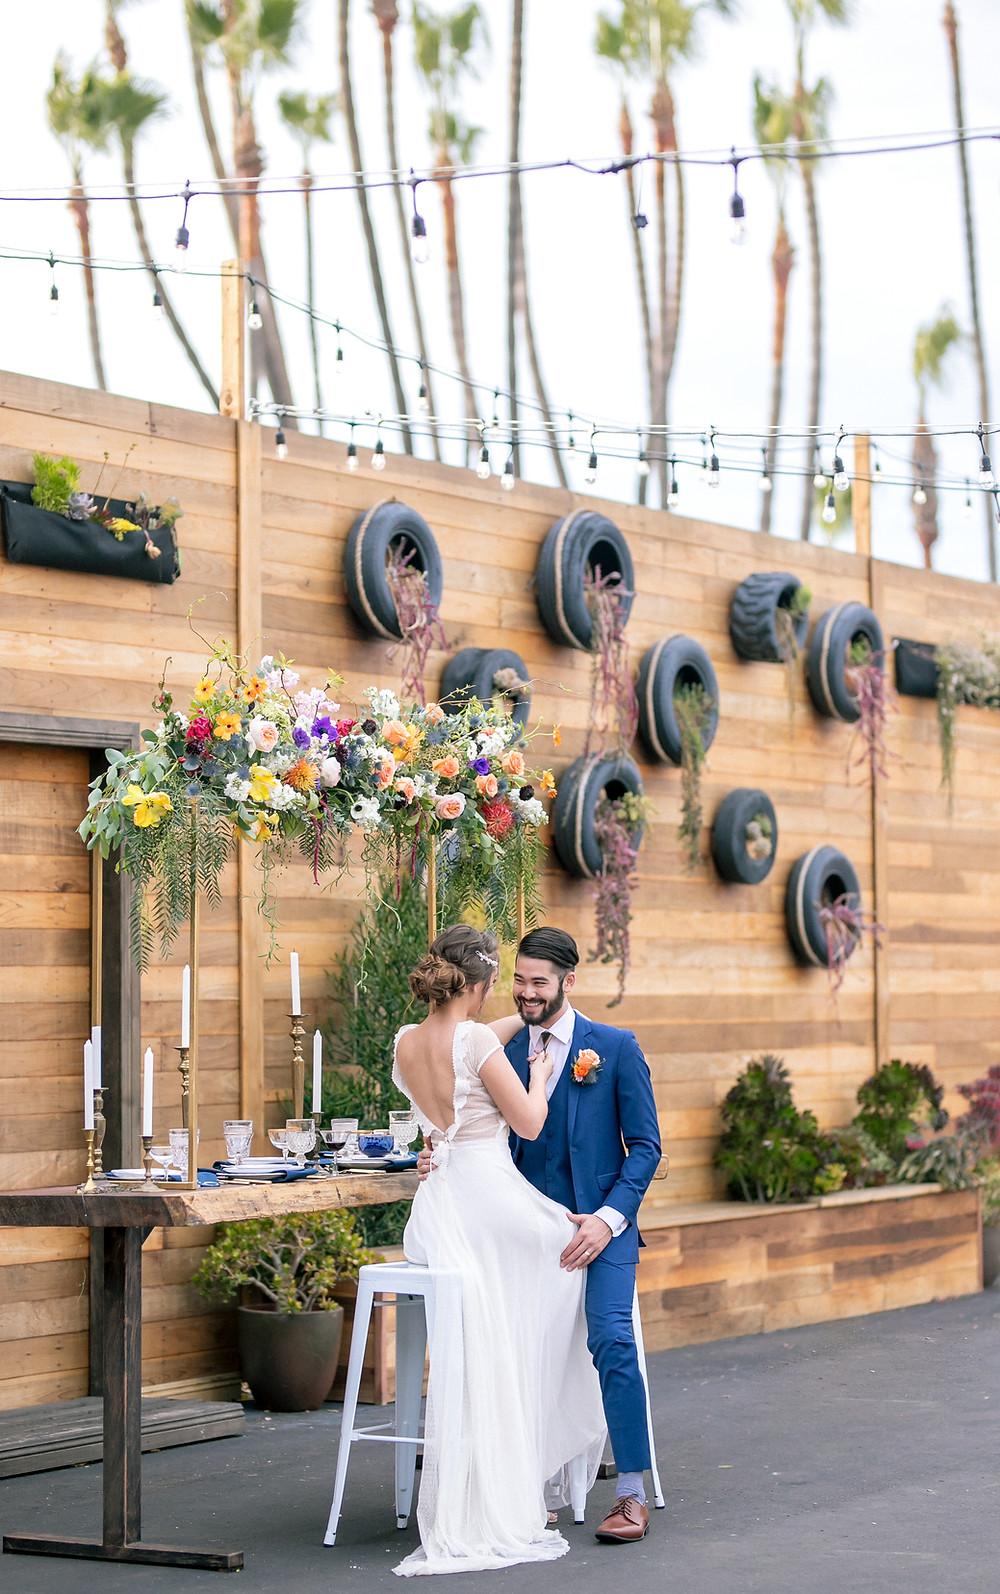 Lot 8 wedding planner san diego